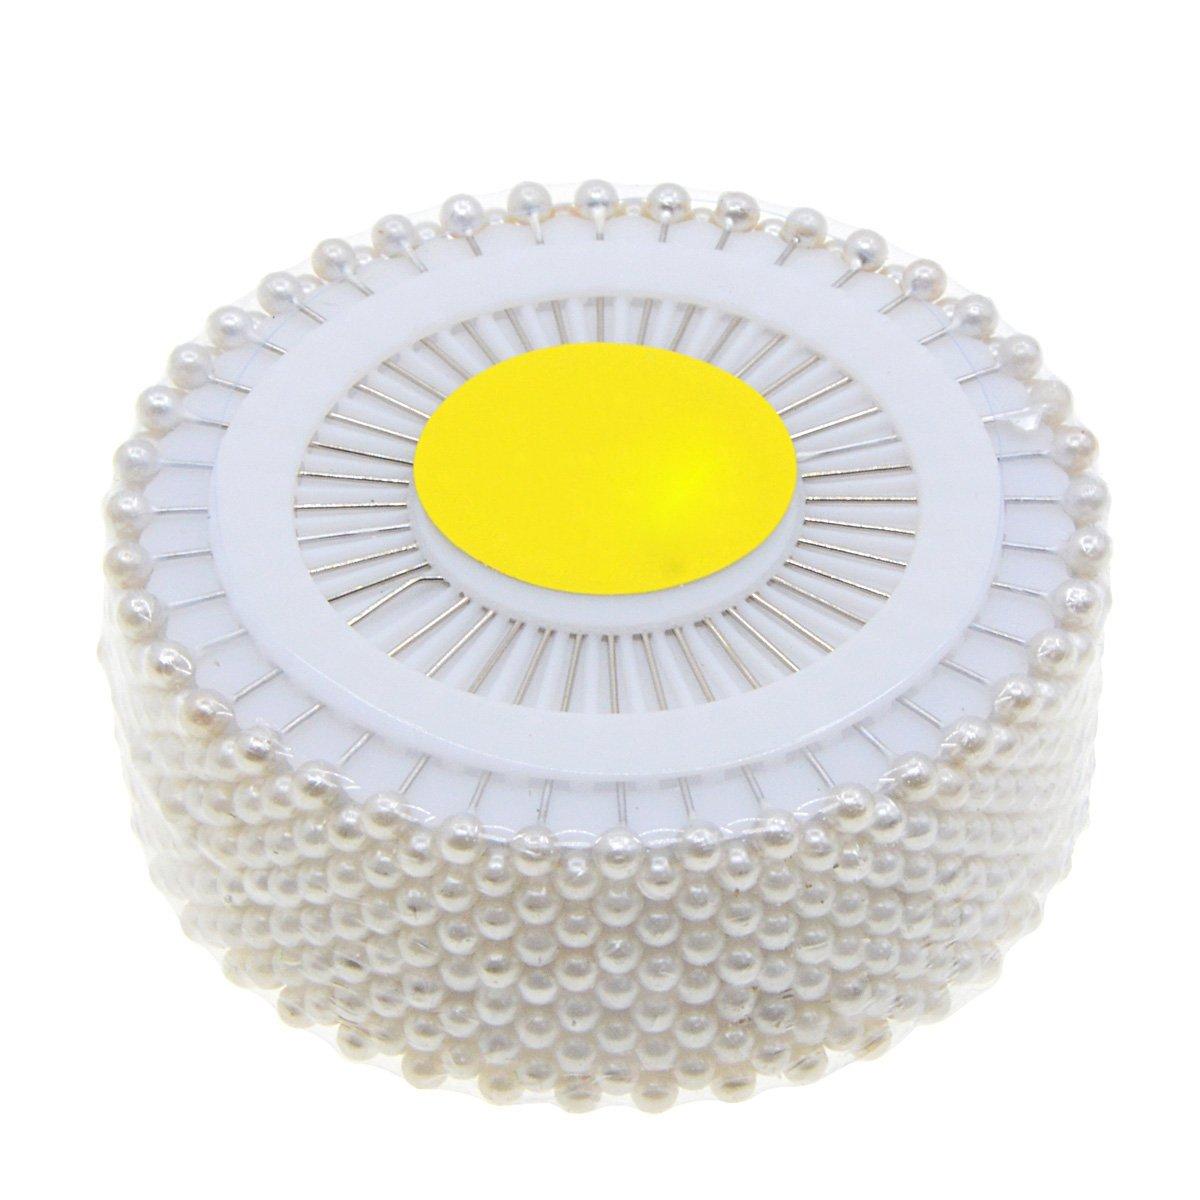 Saim 480pcs Decorative Round Faux Pearl Head Corsage Sewing Pins Straight Dressmaking Pins GG-G5IN-H401